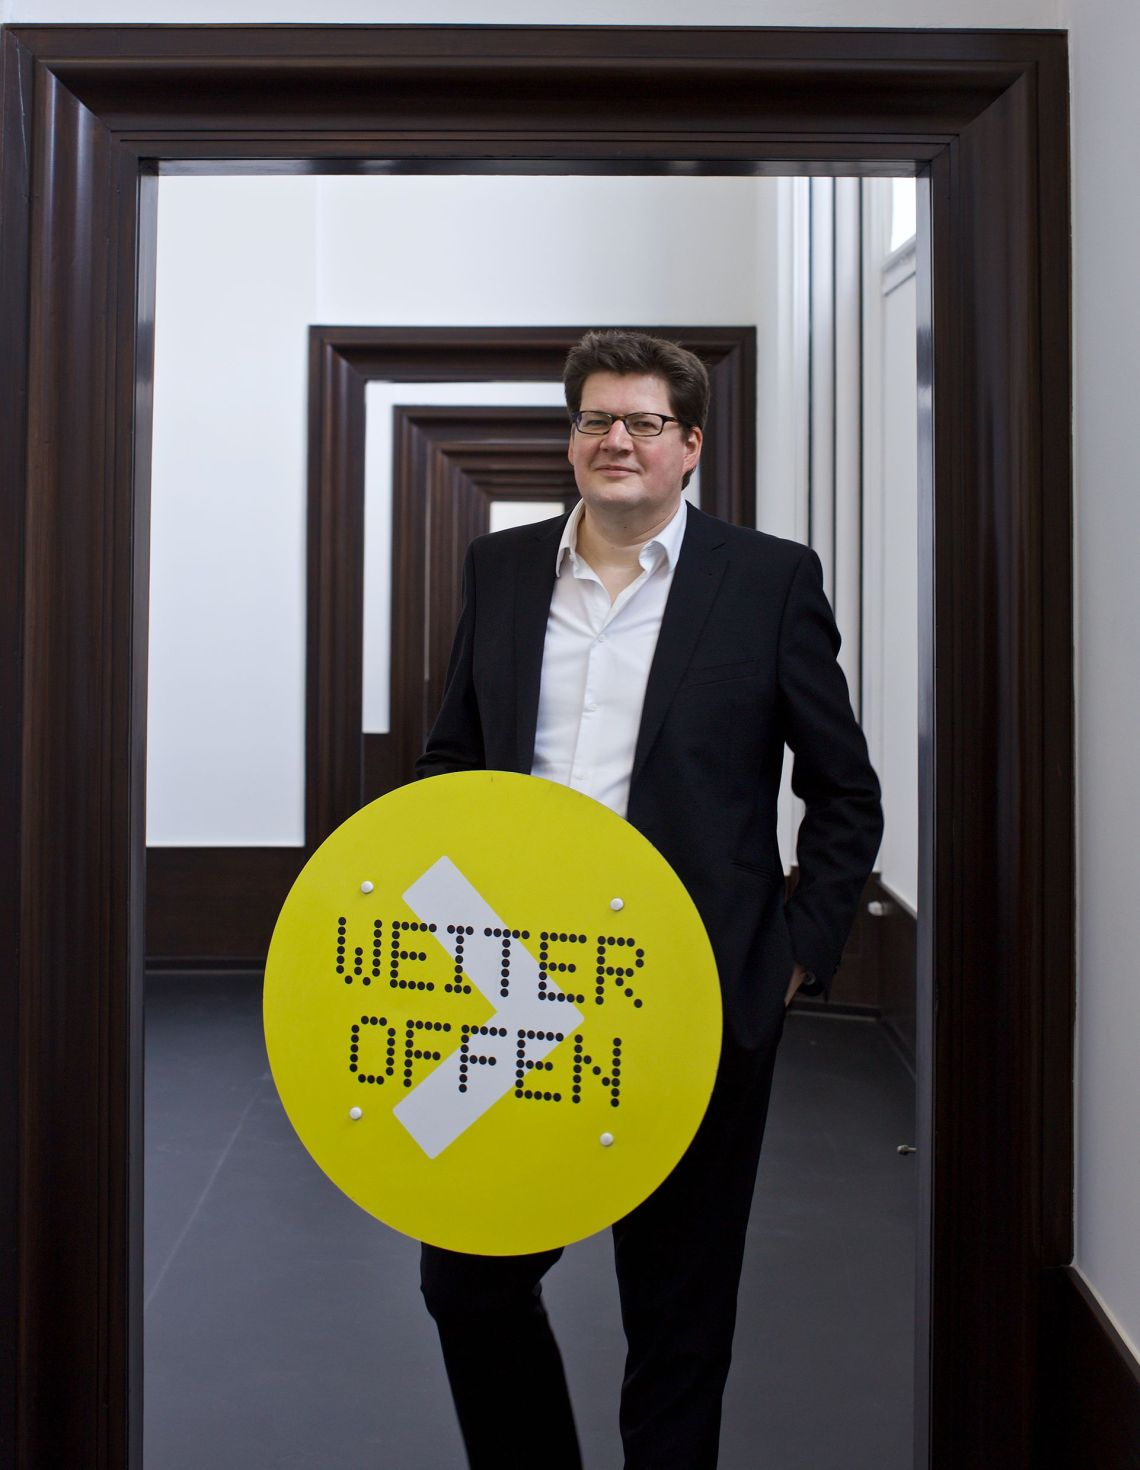 Jan Metzler (c) Hamburger Kunsthalle